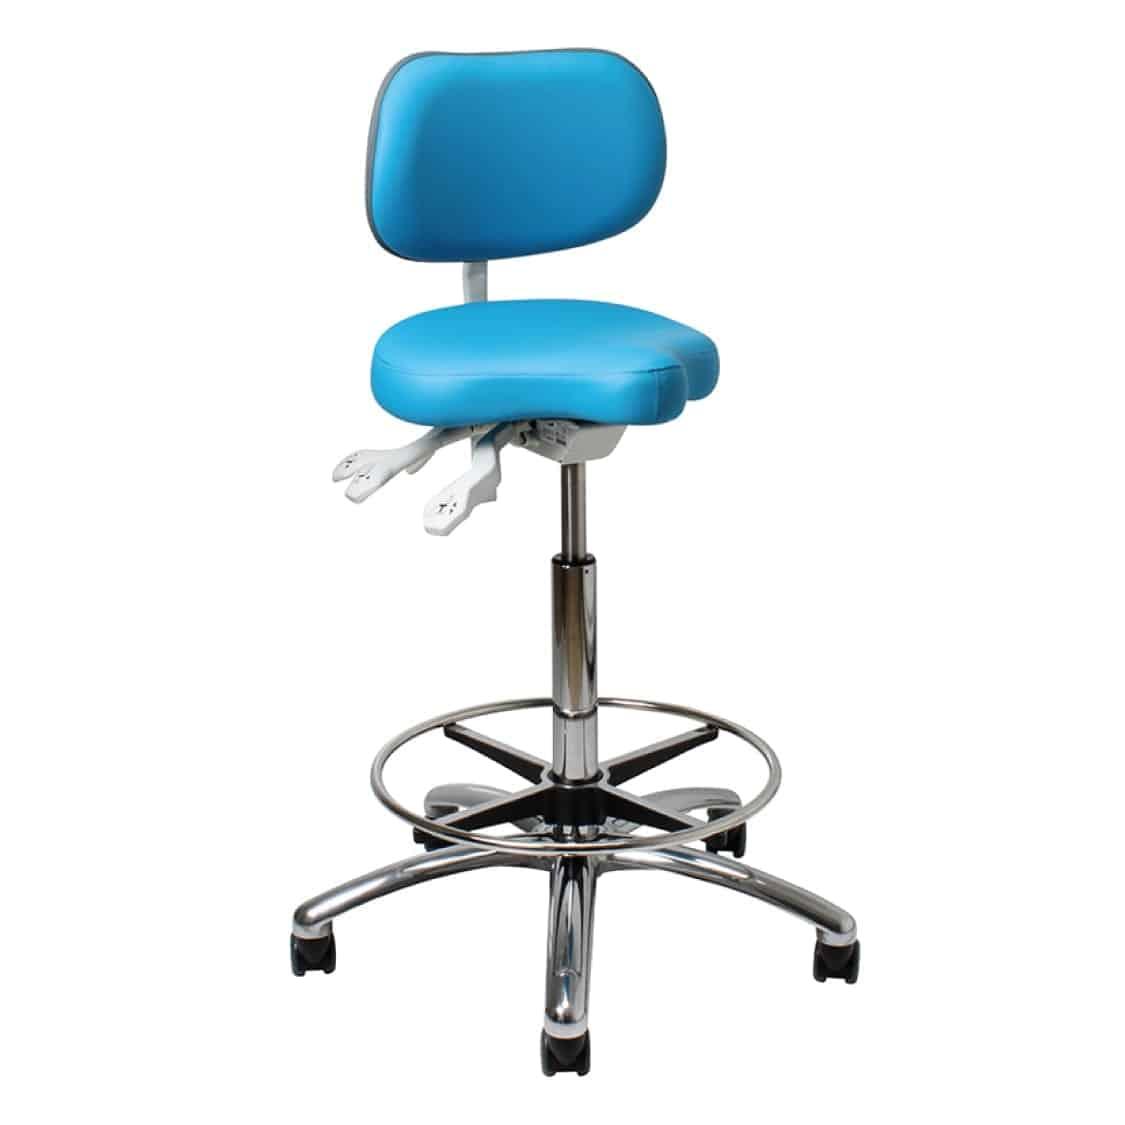 nhs posture chair who sells beach chairs samba option 3 agile medical